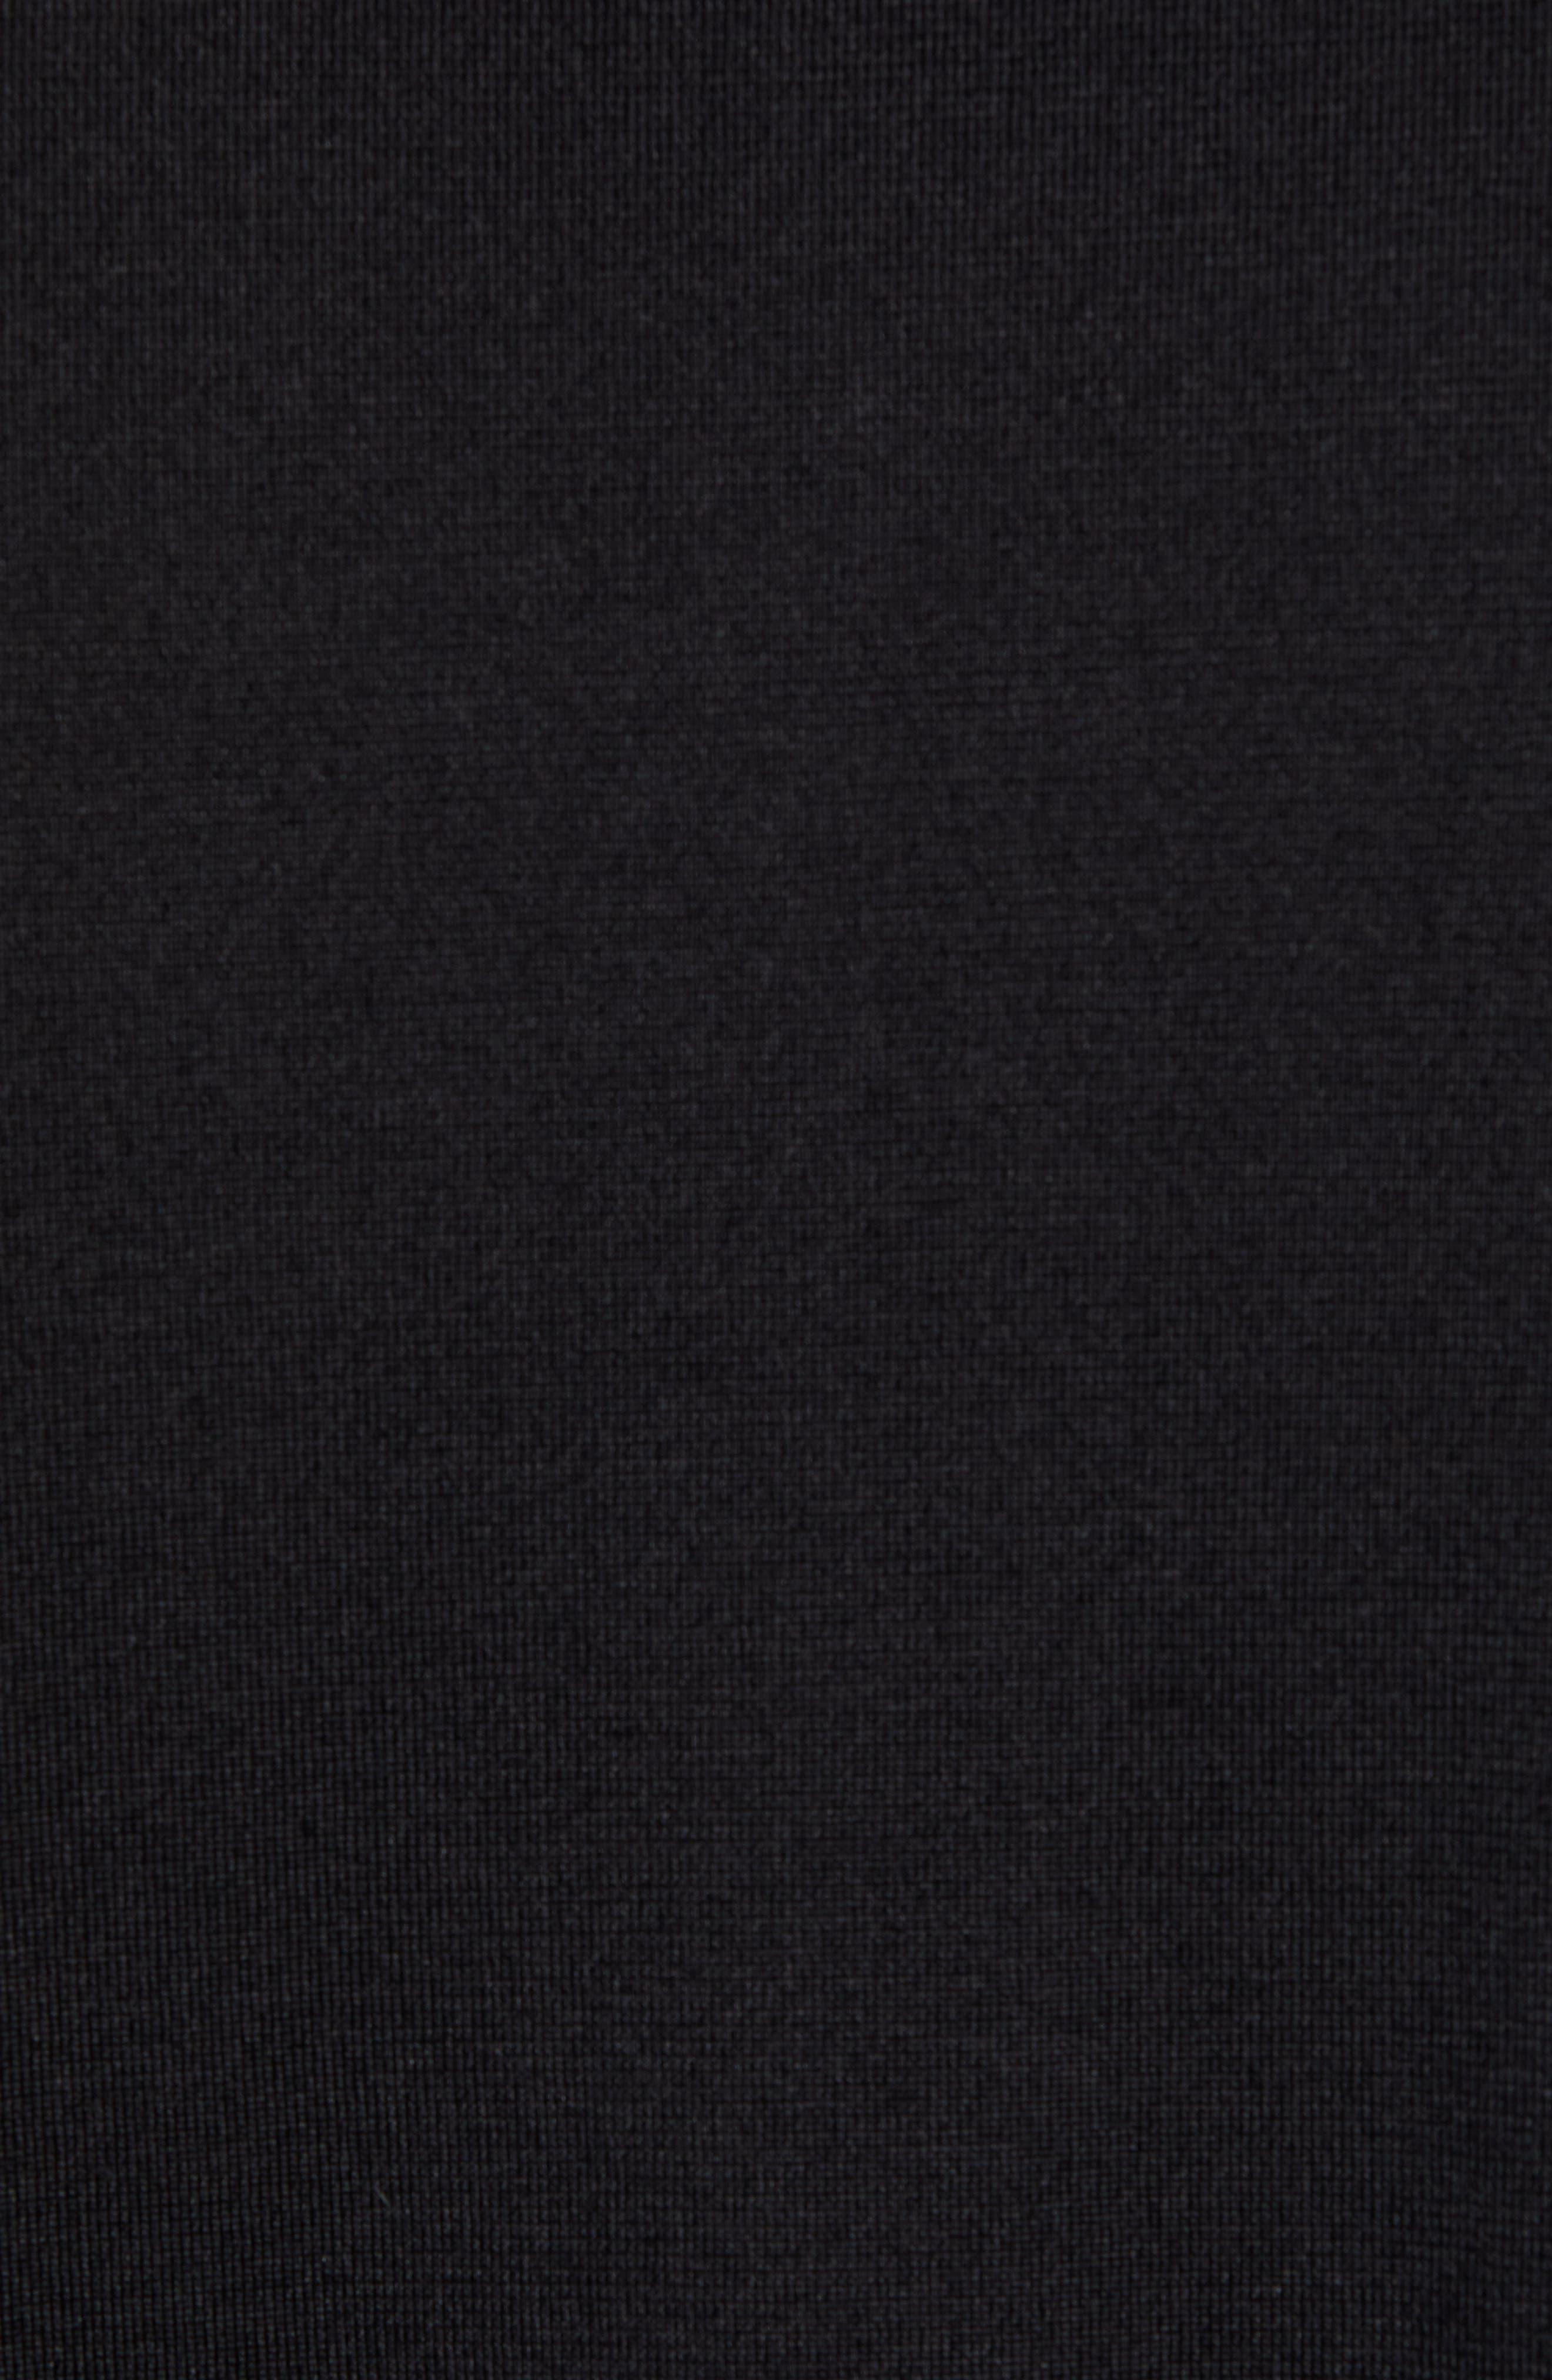 Incisi Slim Fit Knit Silk Blend Shirt,                             Alternate thumbnail 5, color,                             BLACK